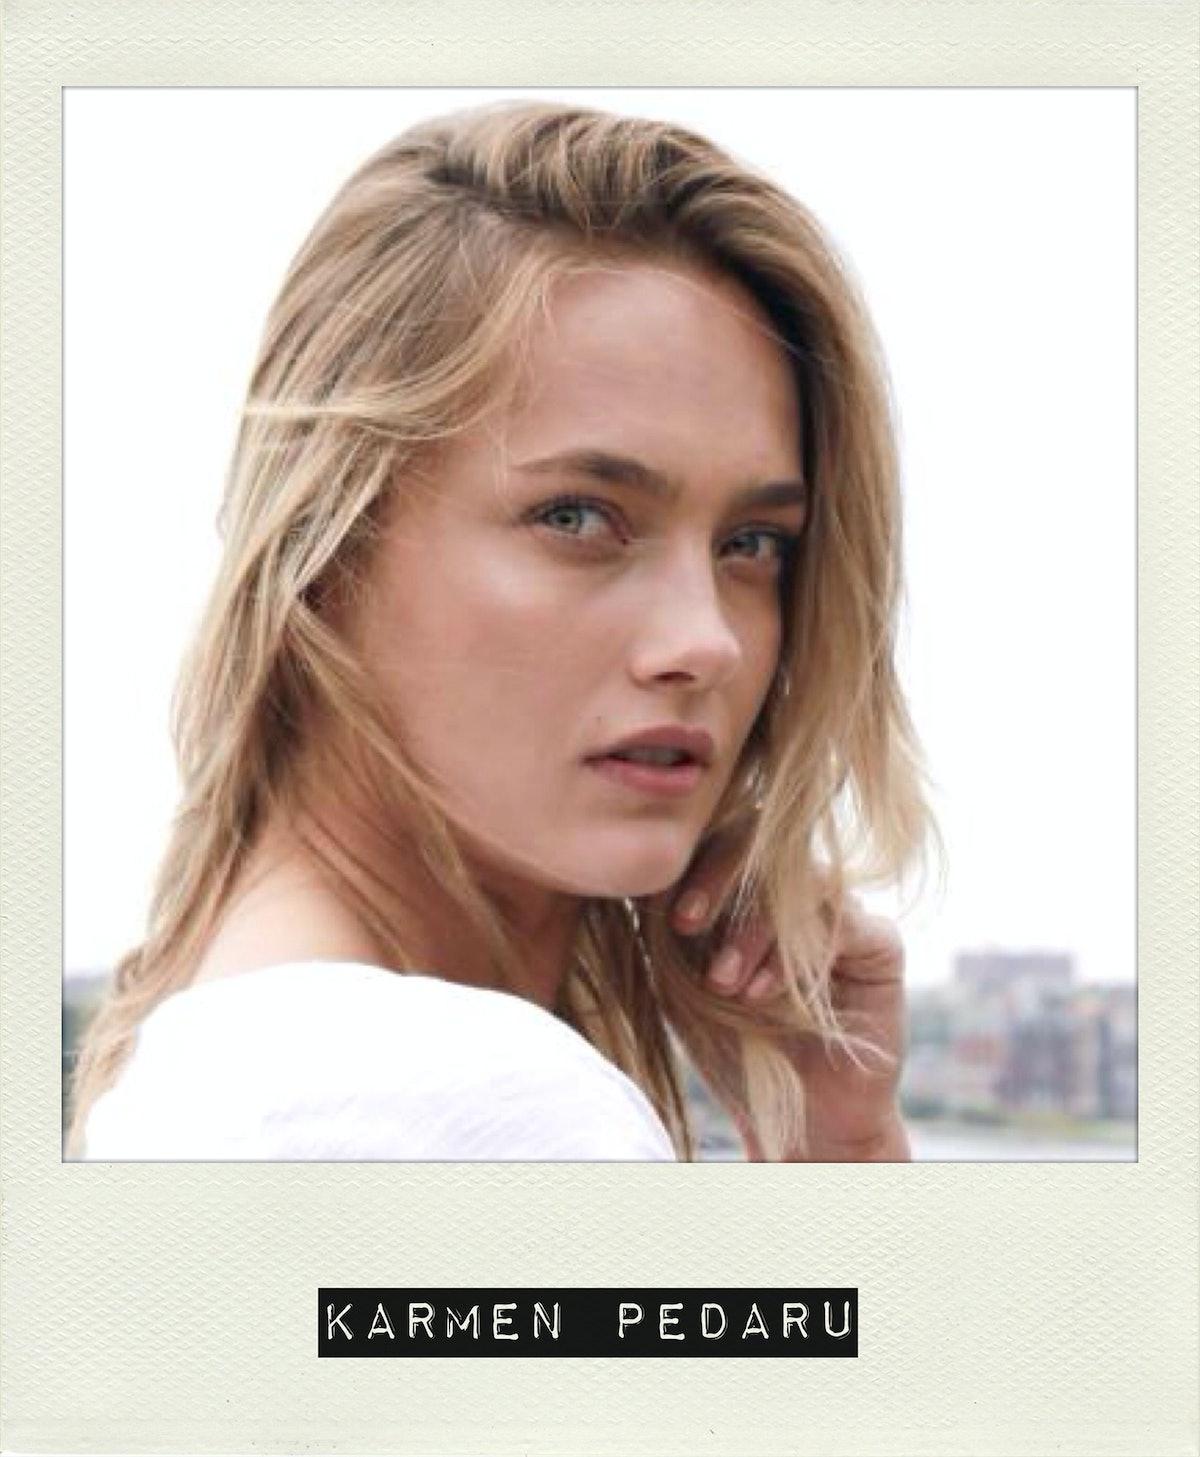 Model Karmen Pedaru Shares Her Beauty Secrets